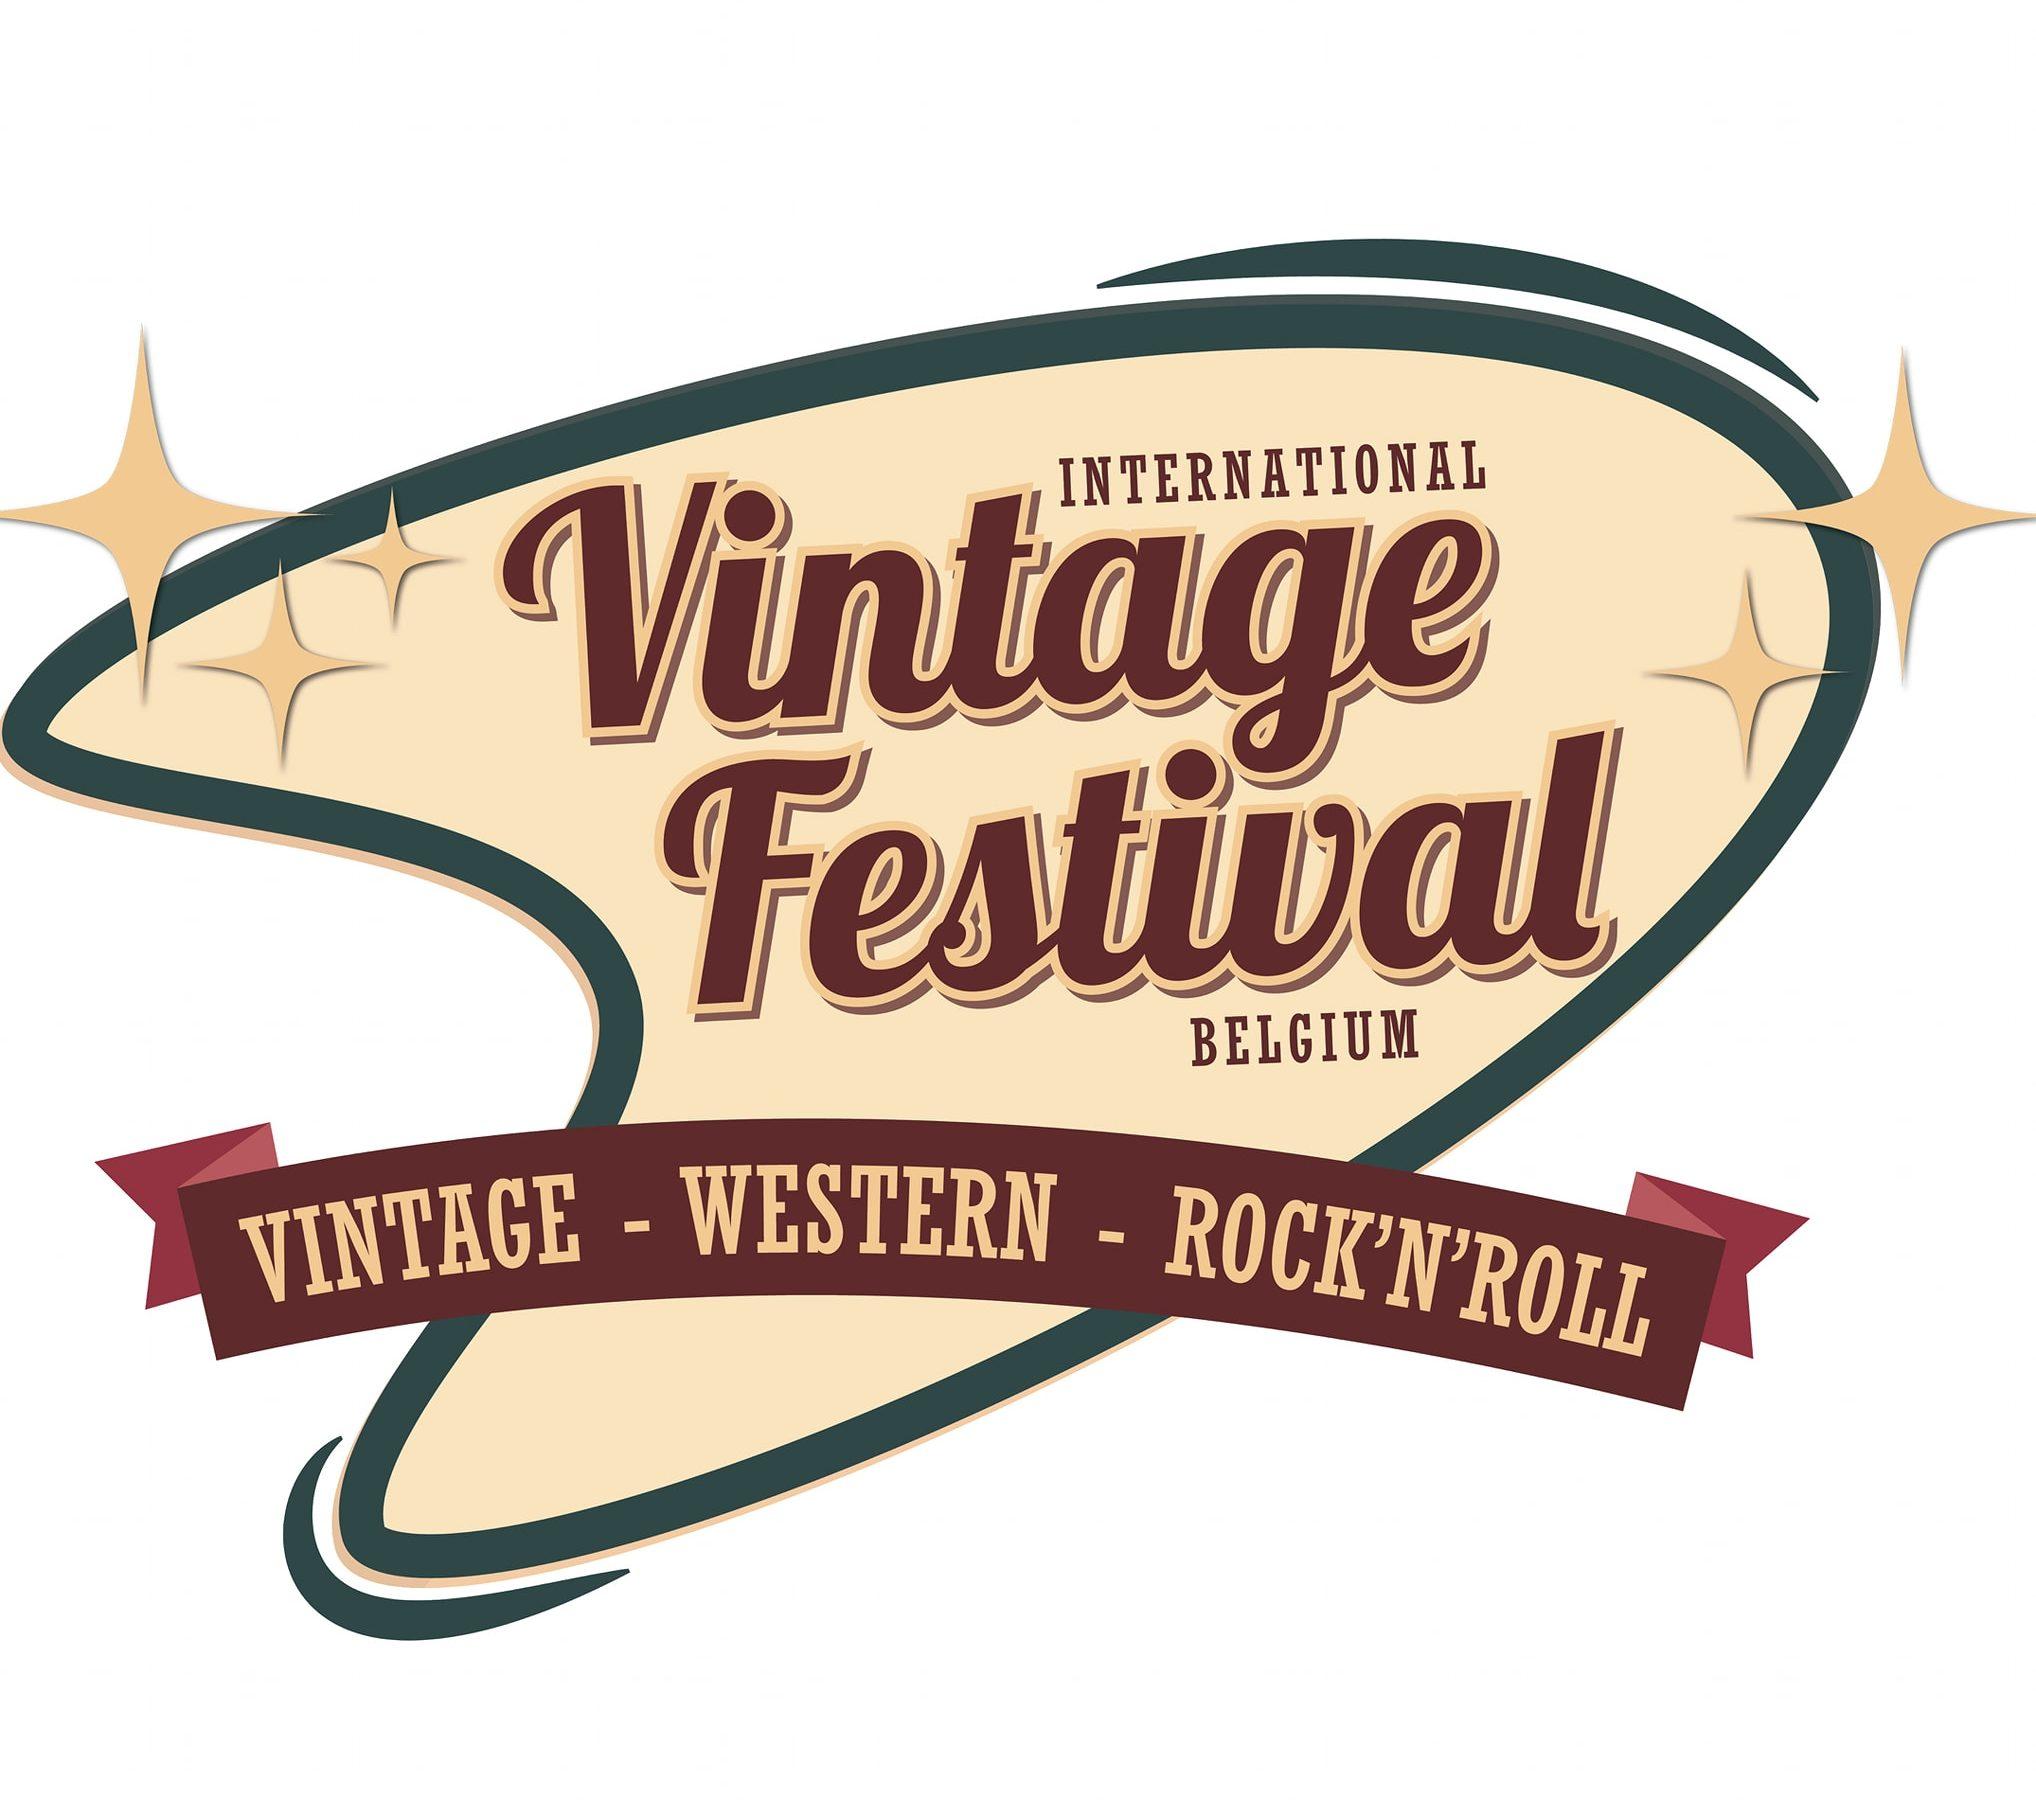 Intl. Vintage Festival